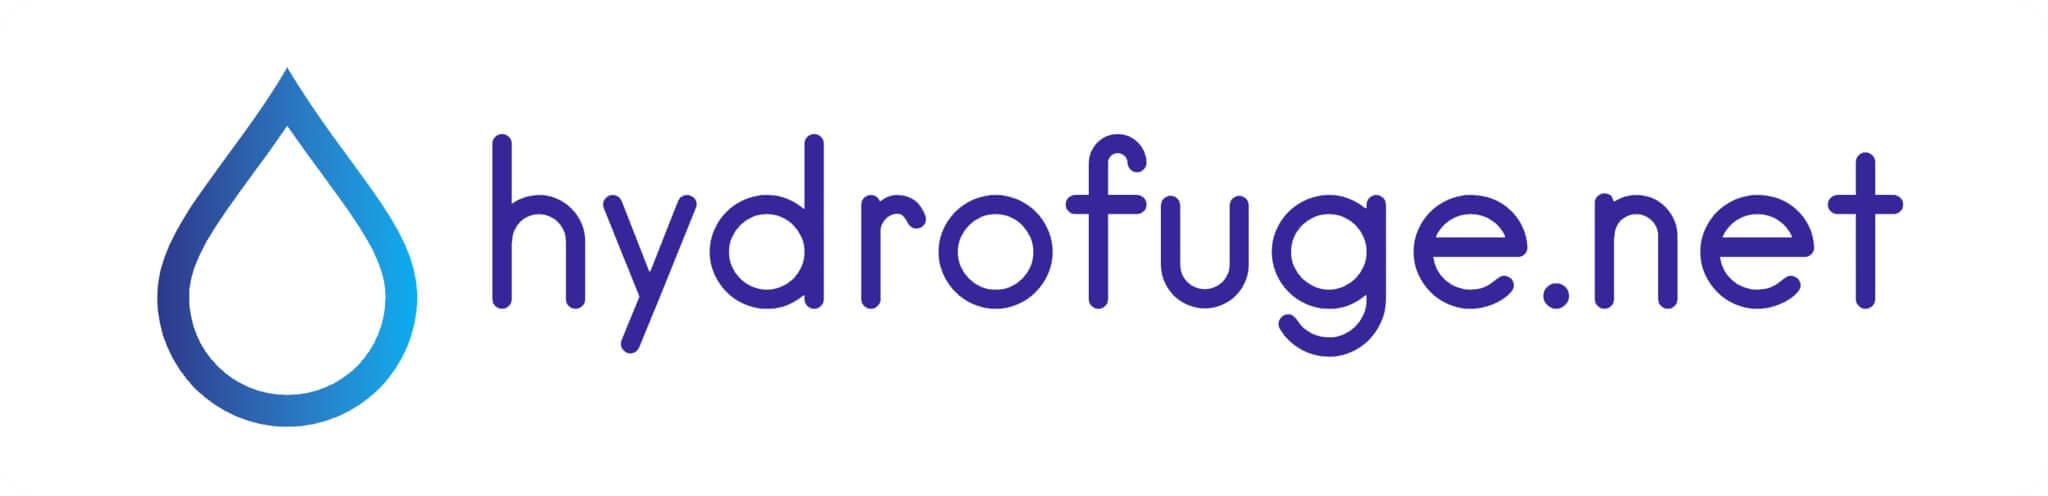 hydrofuge.net_logo_white